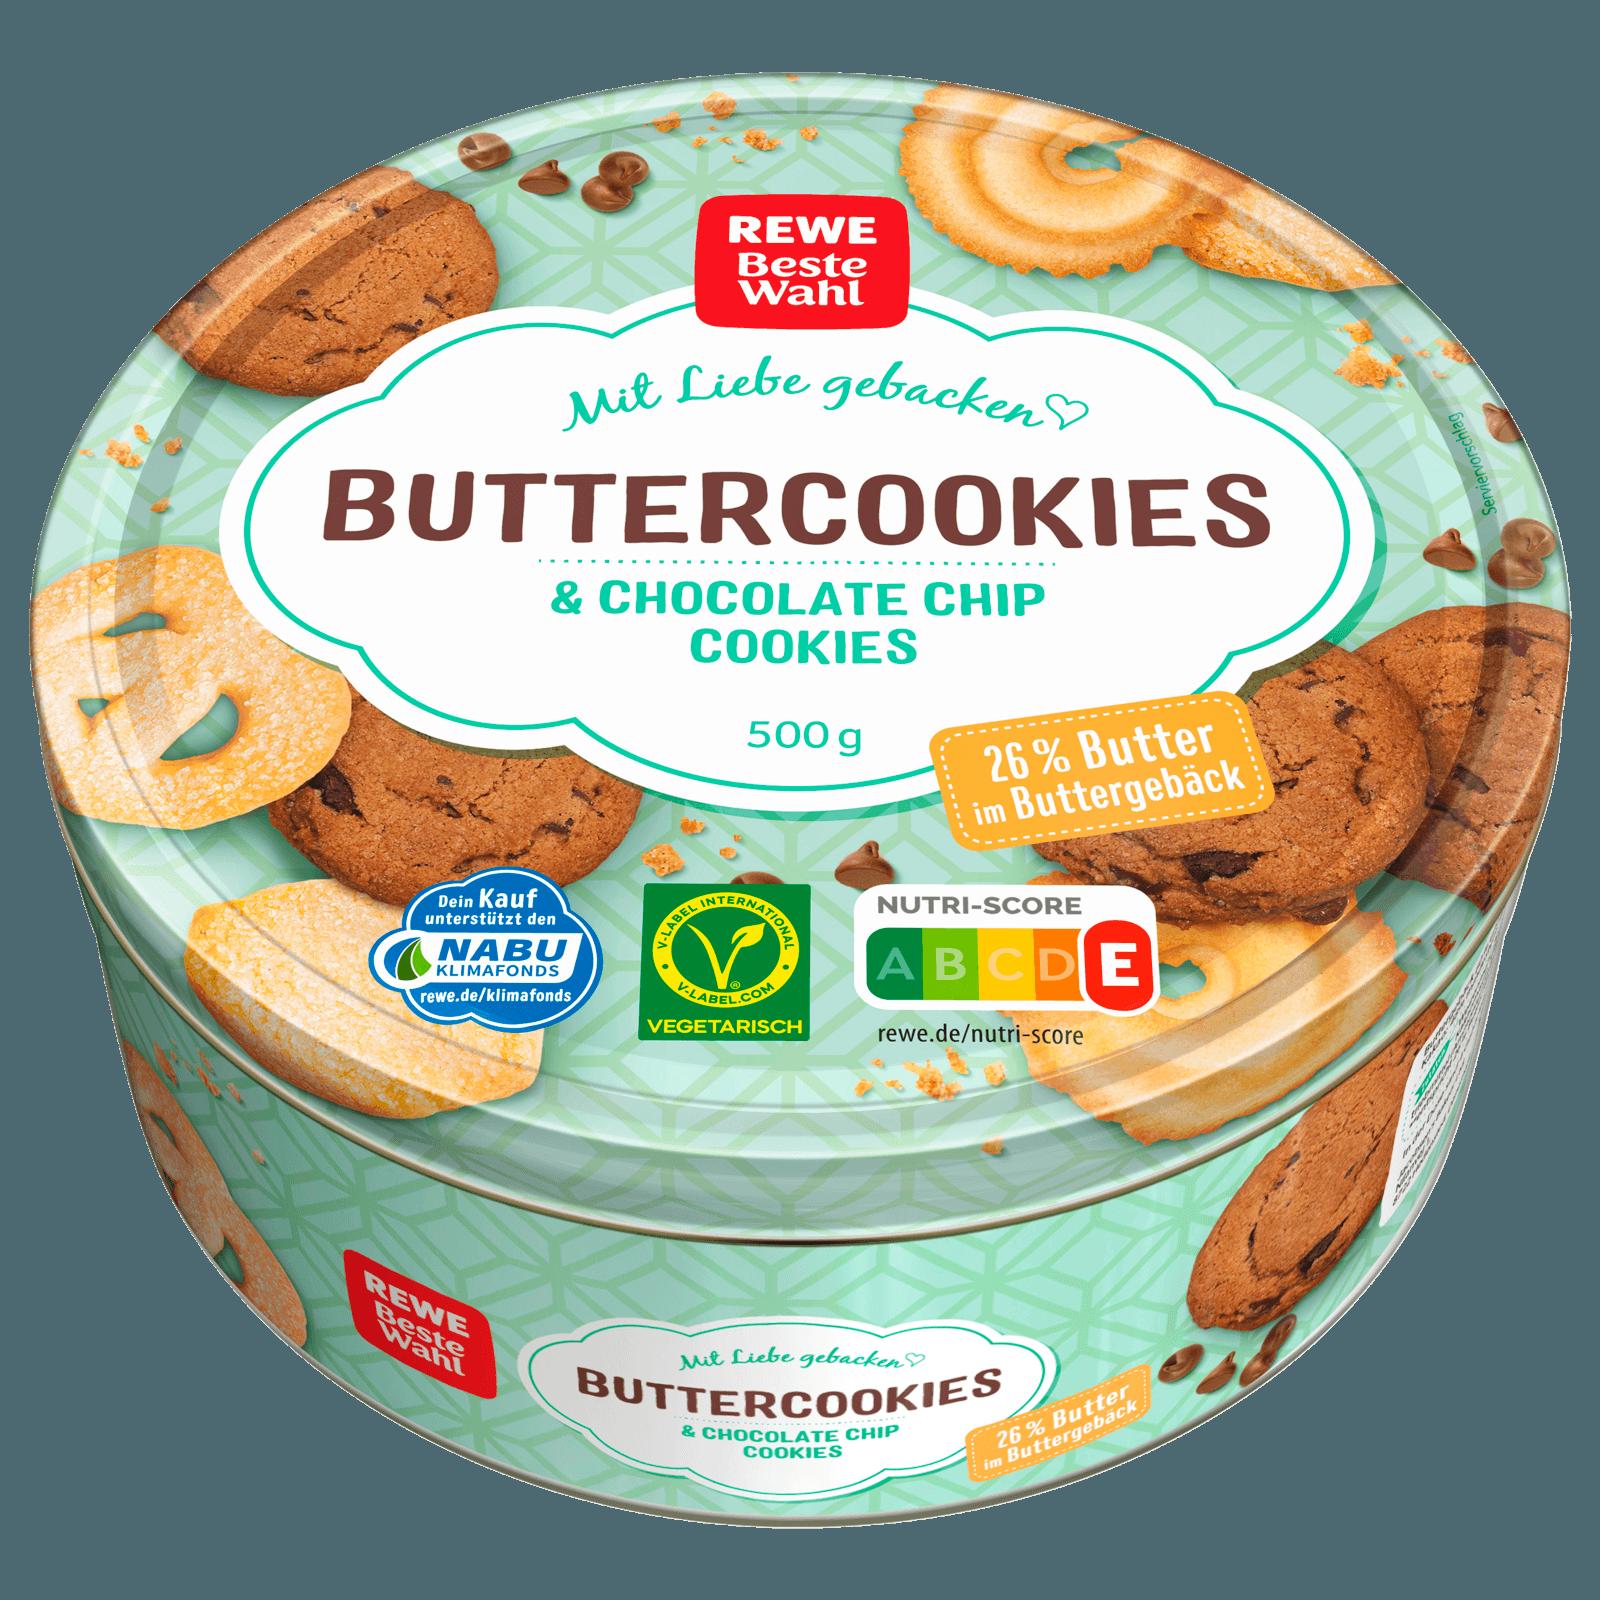 REWE Beste Wahl Danish Buttercookies & Chocolate Chip Cookies 20g ...